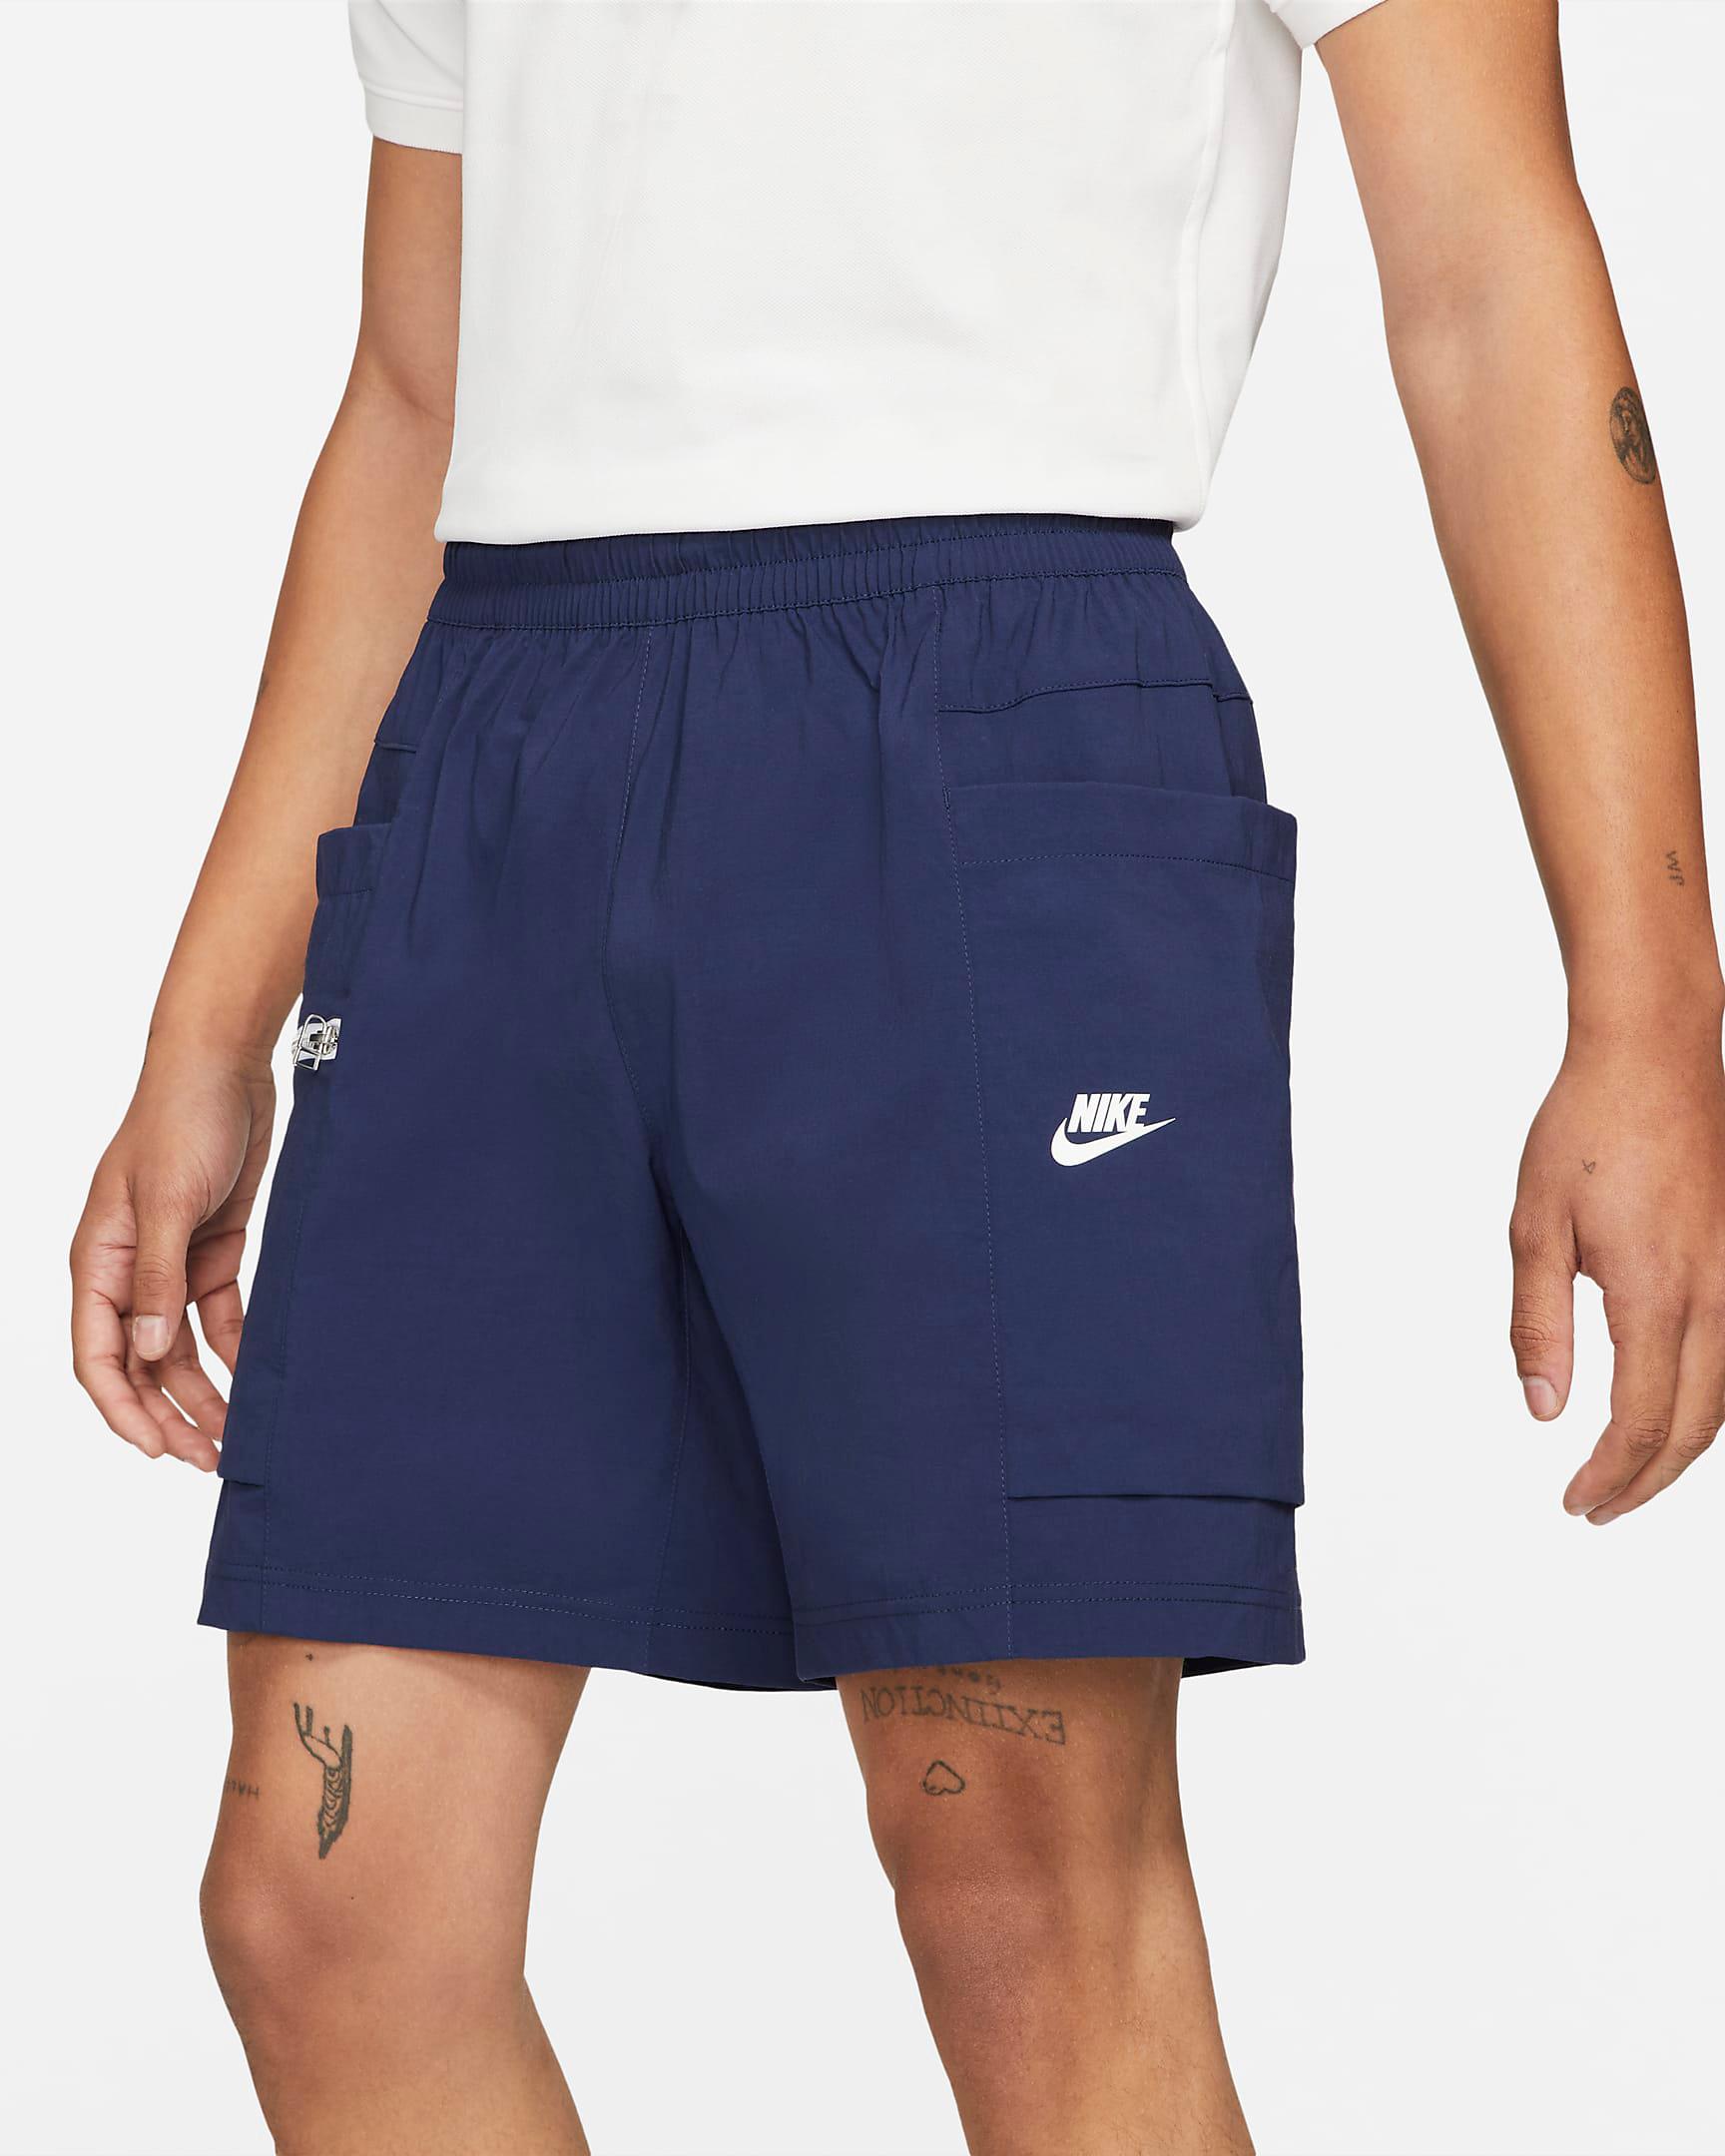 nike-midnight-navy-modern-woven-shorts-1